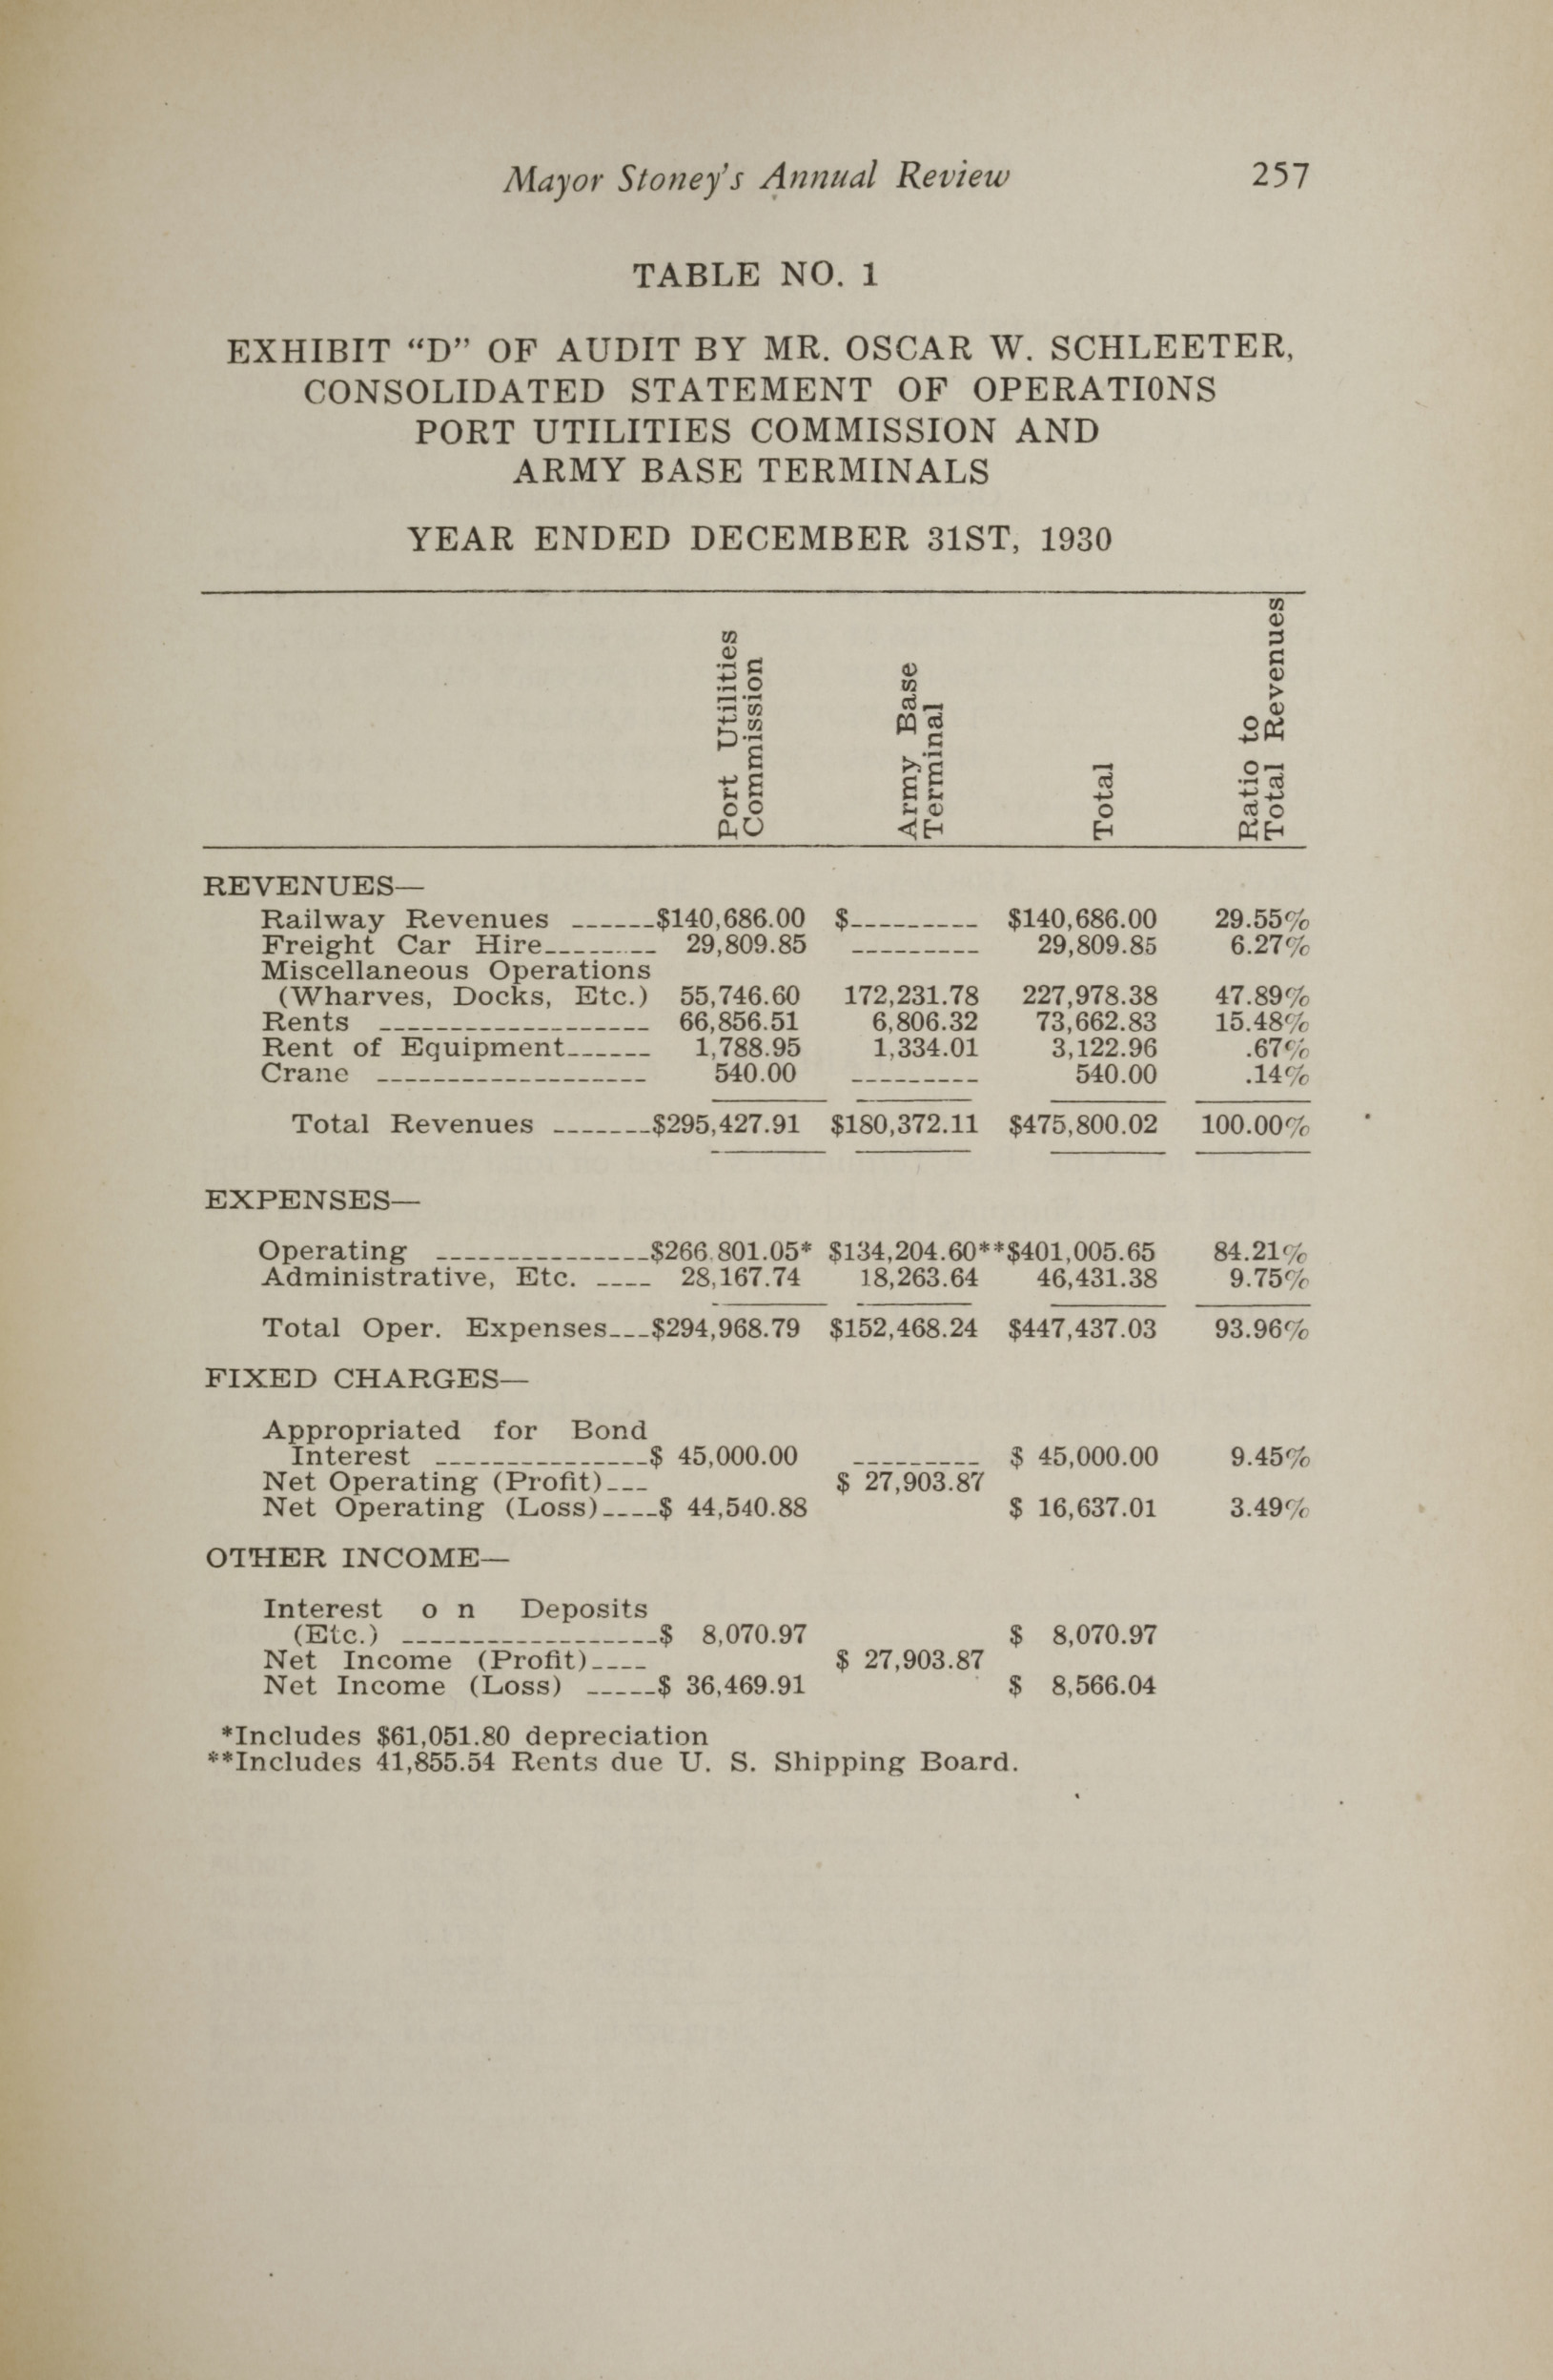 Charleston Yearbook, 1930, page 257